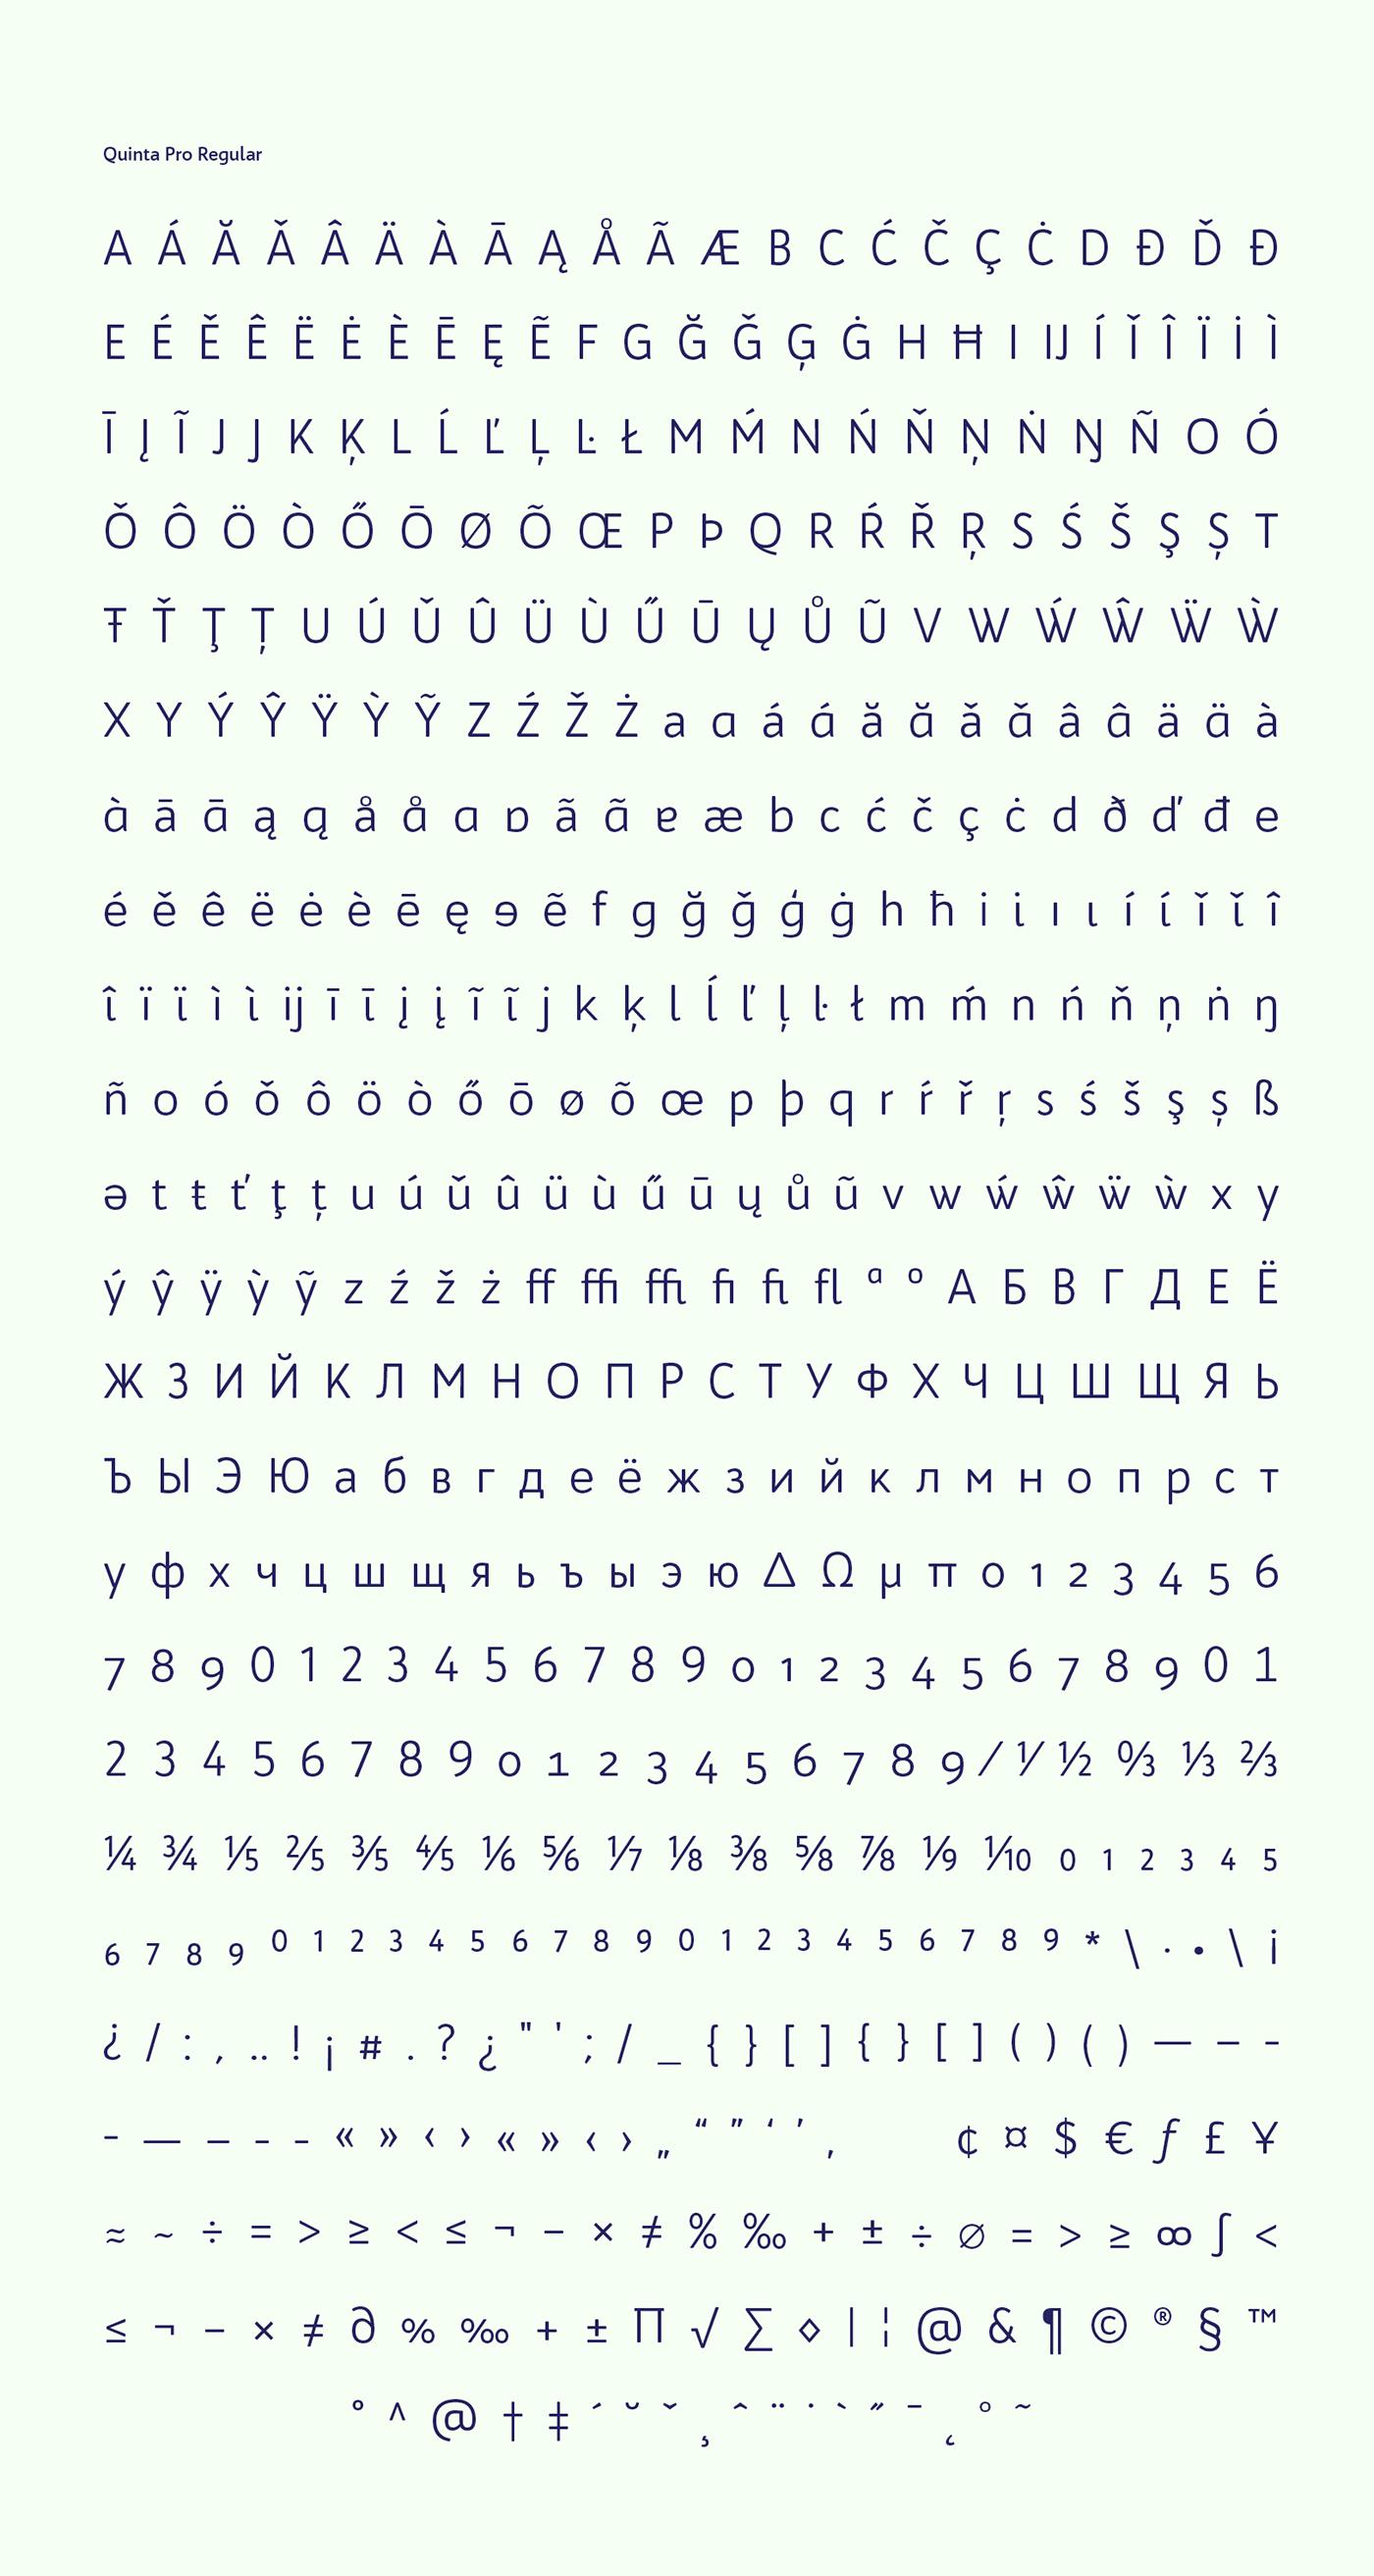 sans sans serif Humanist Typeface font Cyrillic Latin contemporary modern free